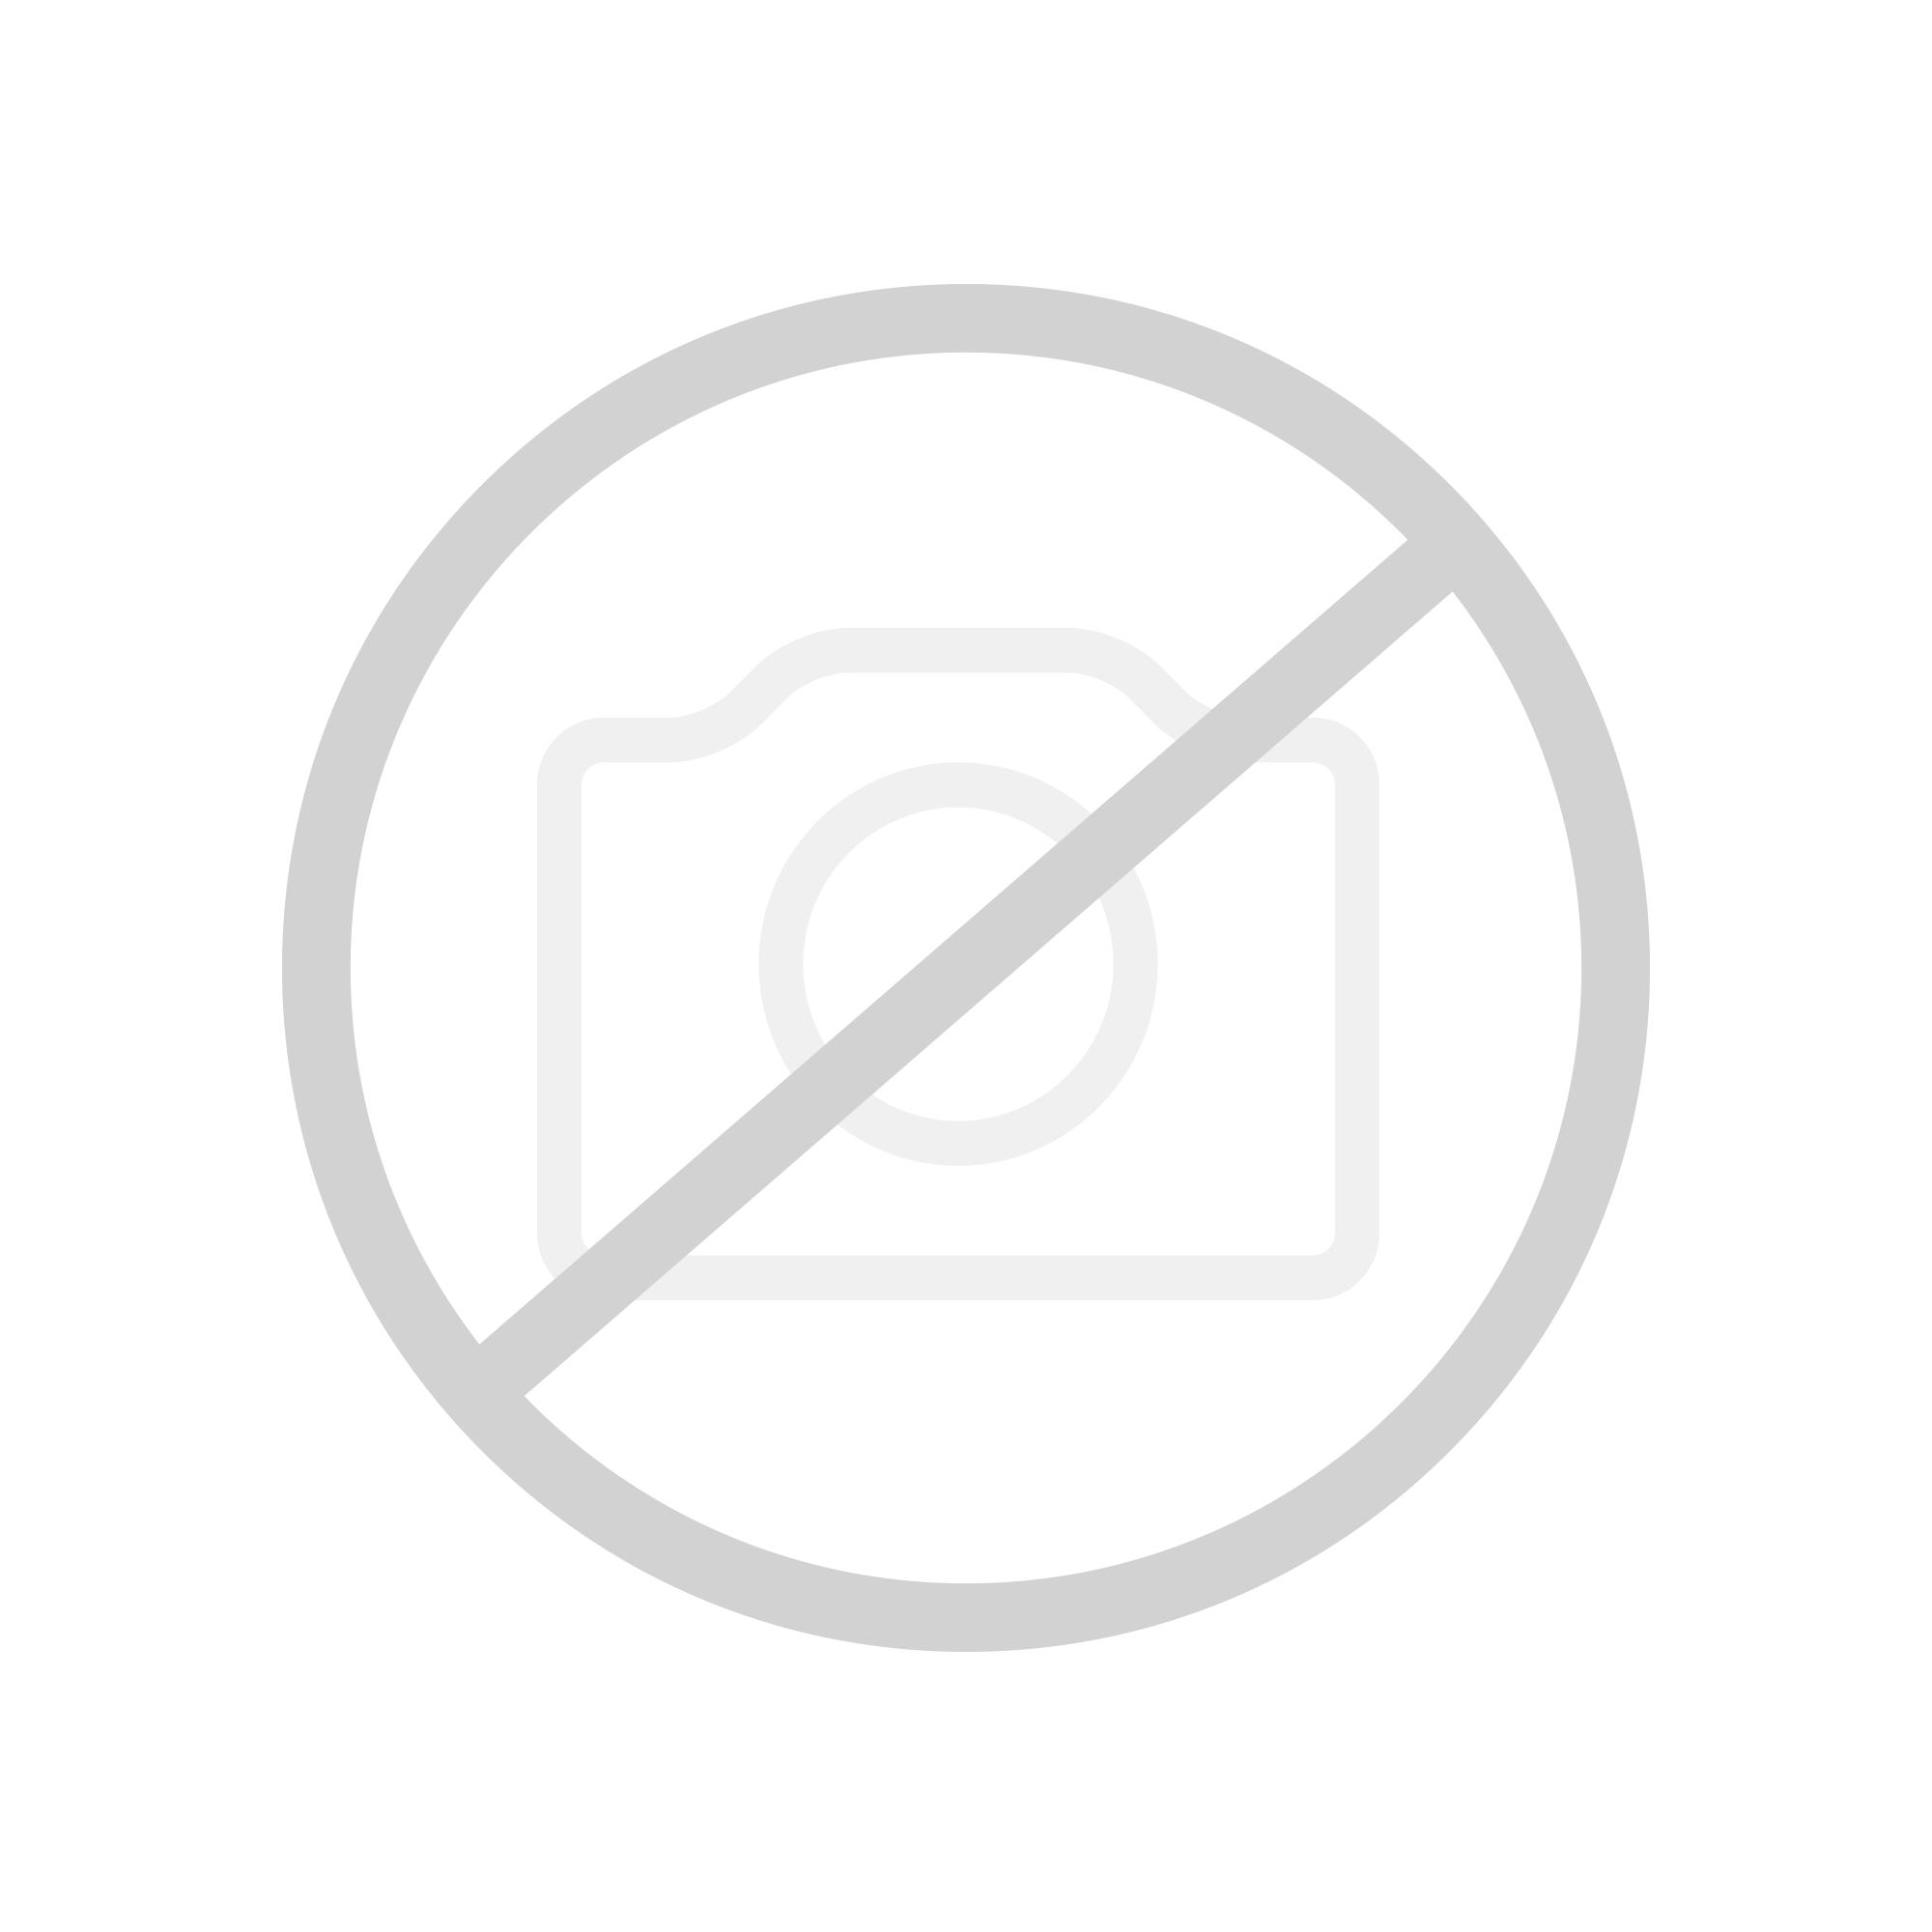 louis poulsen Baldachin für PH Artichoke (Zapfen) Ø 48 cm